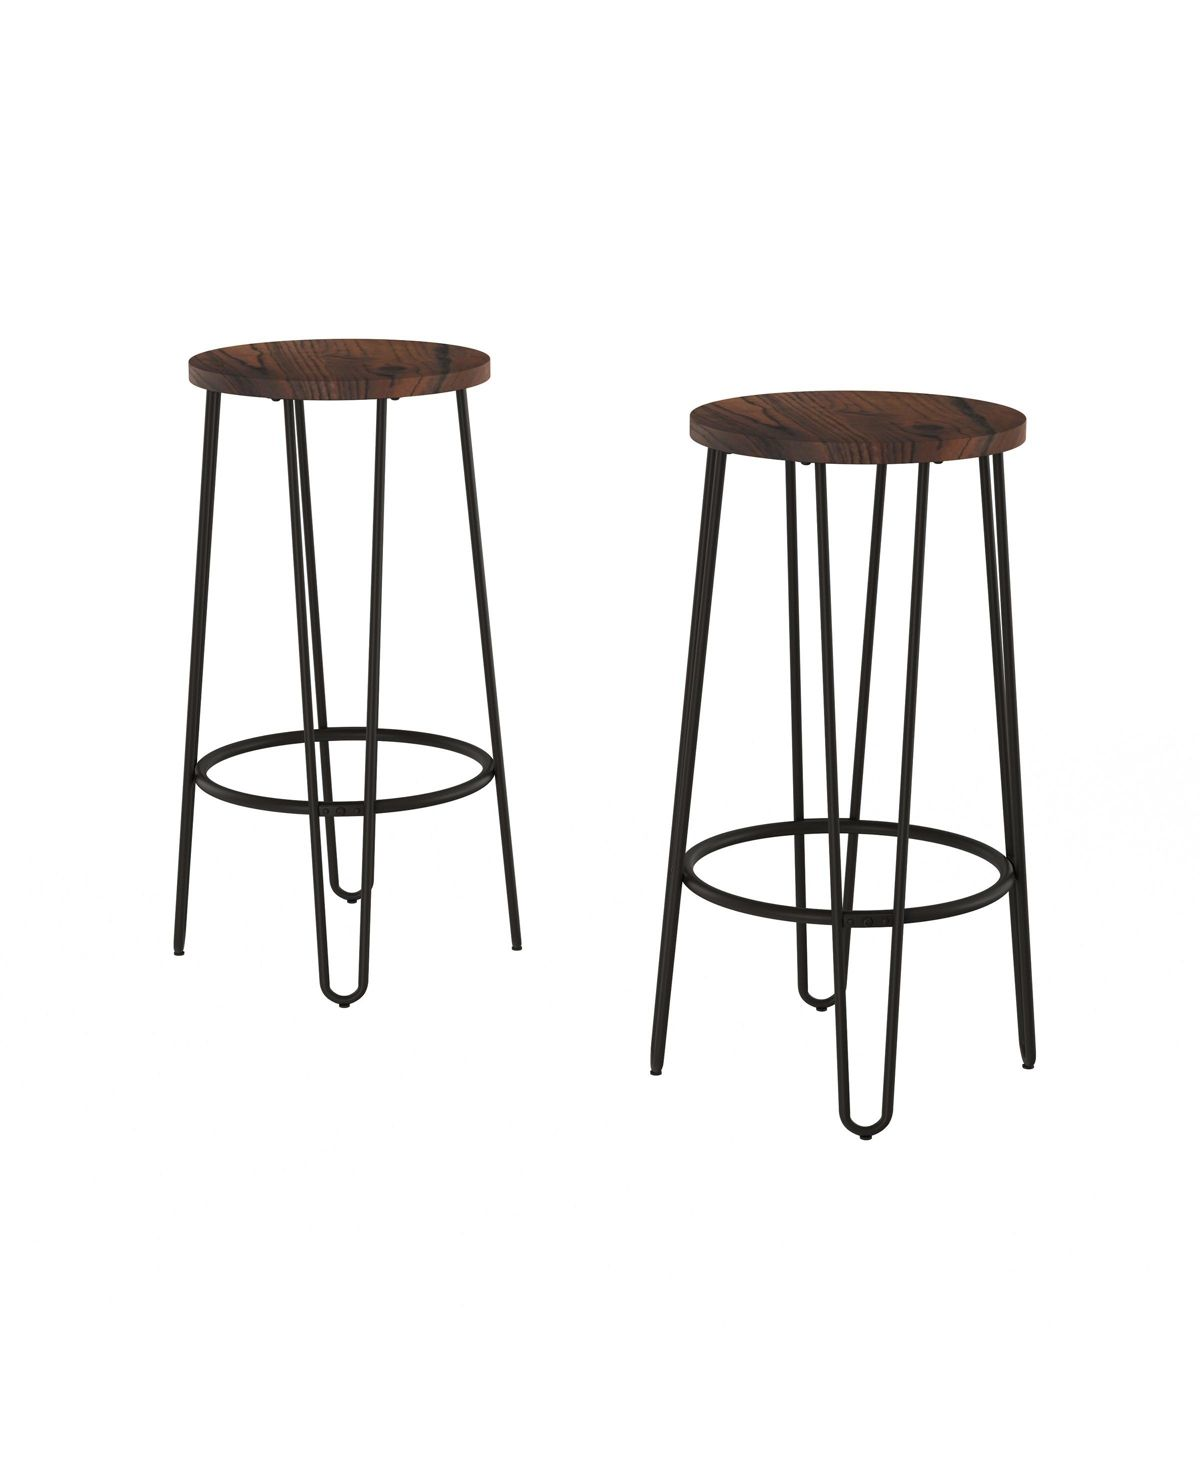 Trademark Global Lavish Home Bar Stool Set Of 2 Reviews